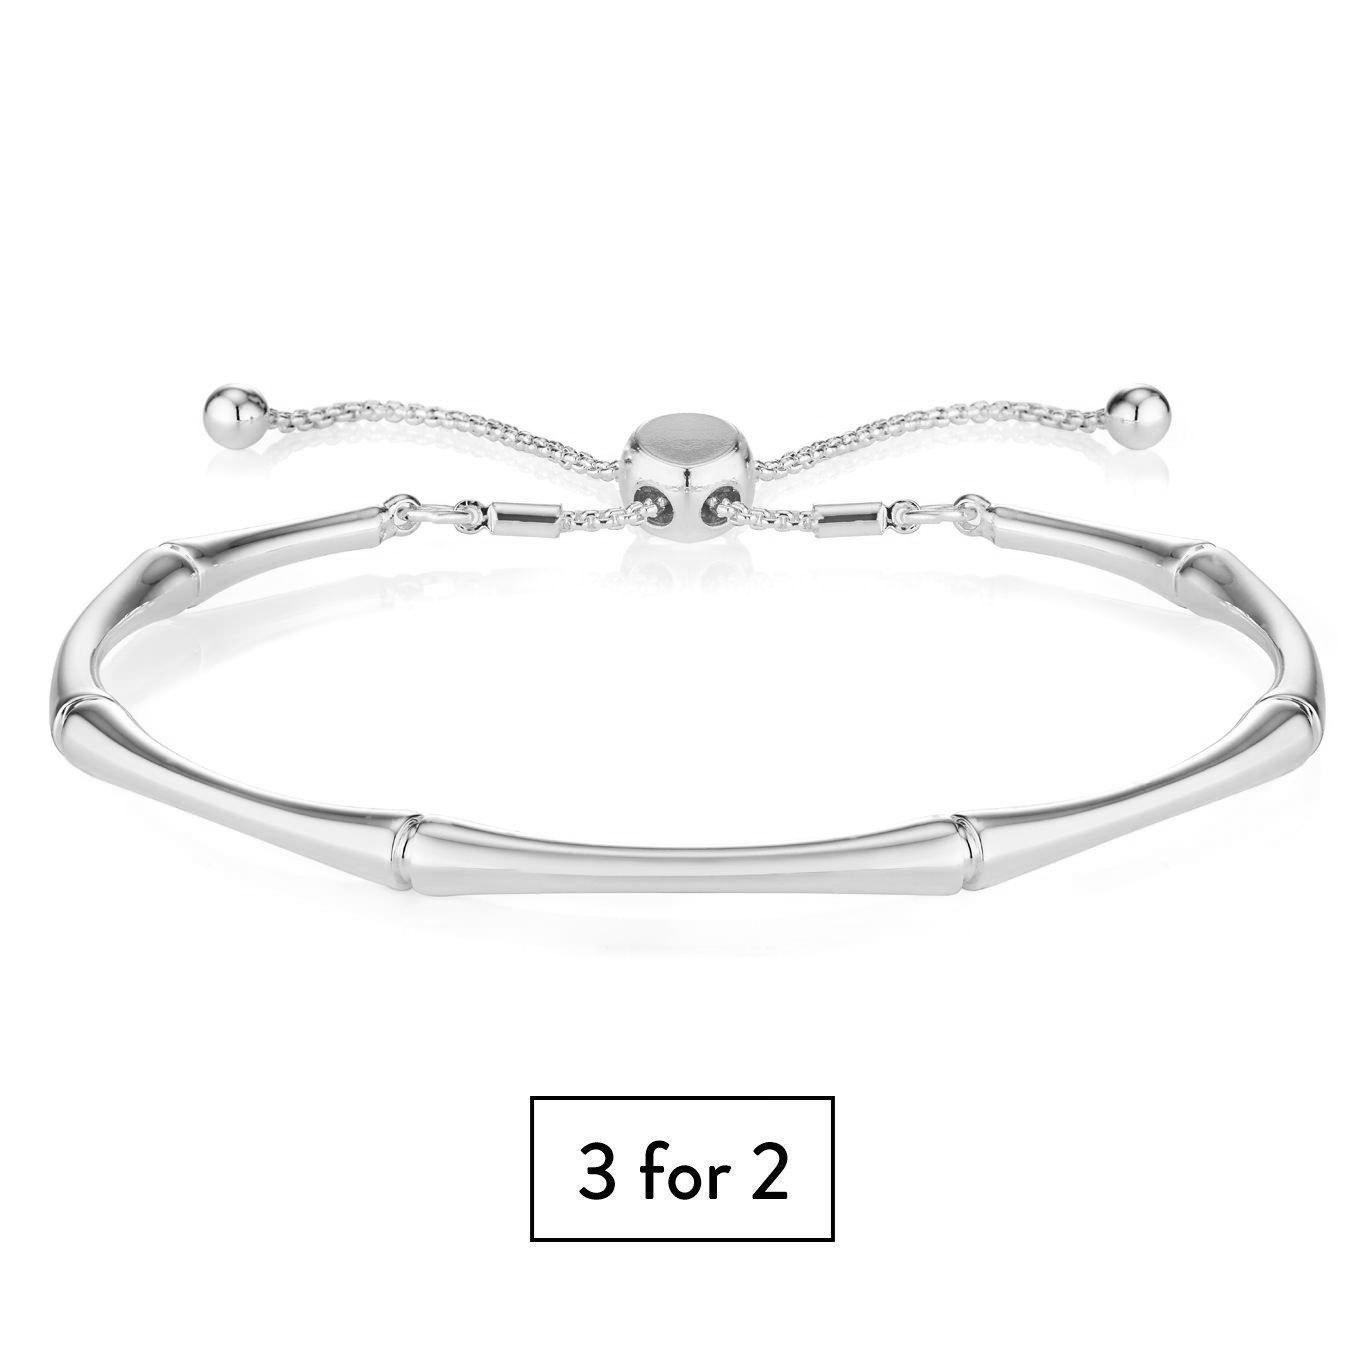 Buckley London Bamboo Bracelet - Silver